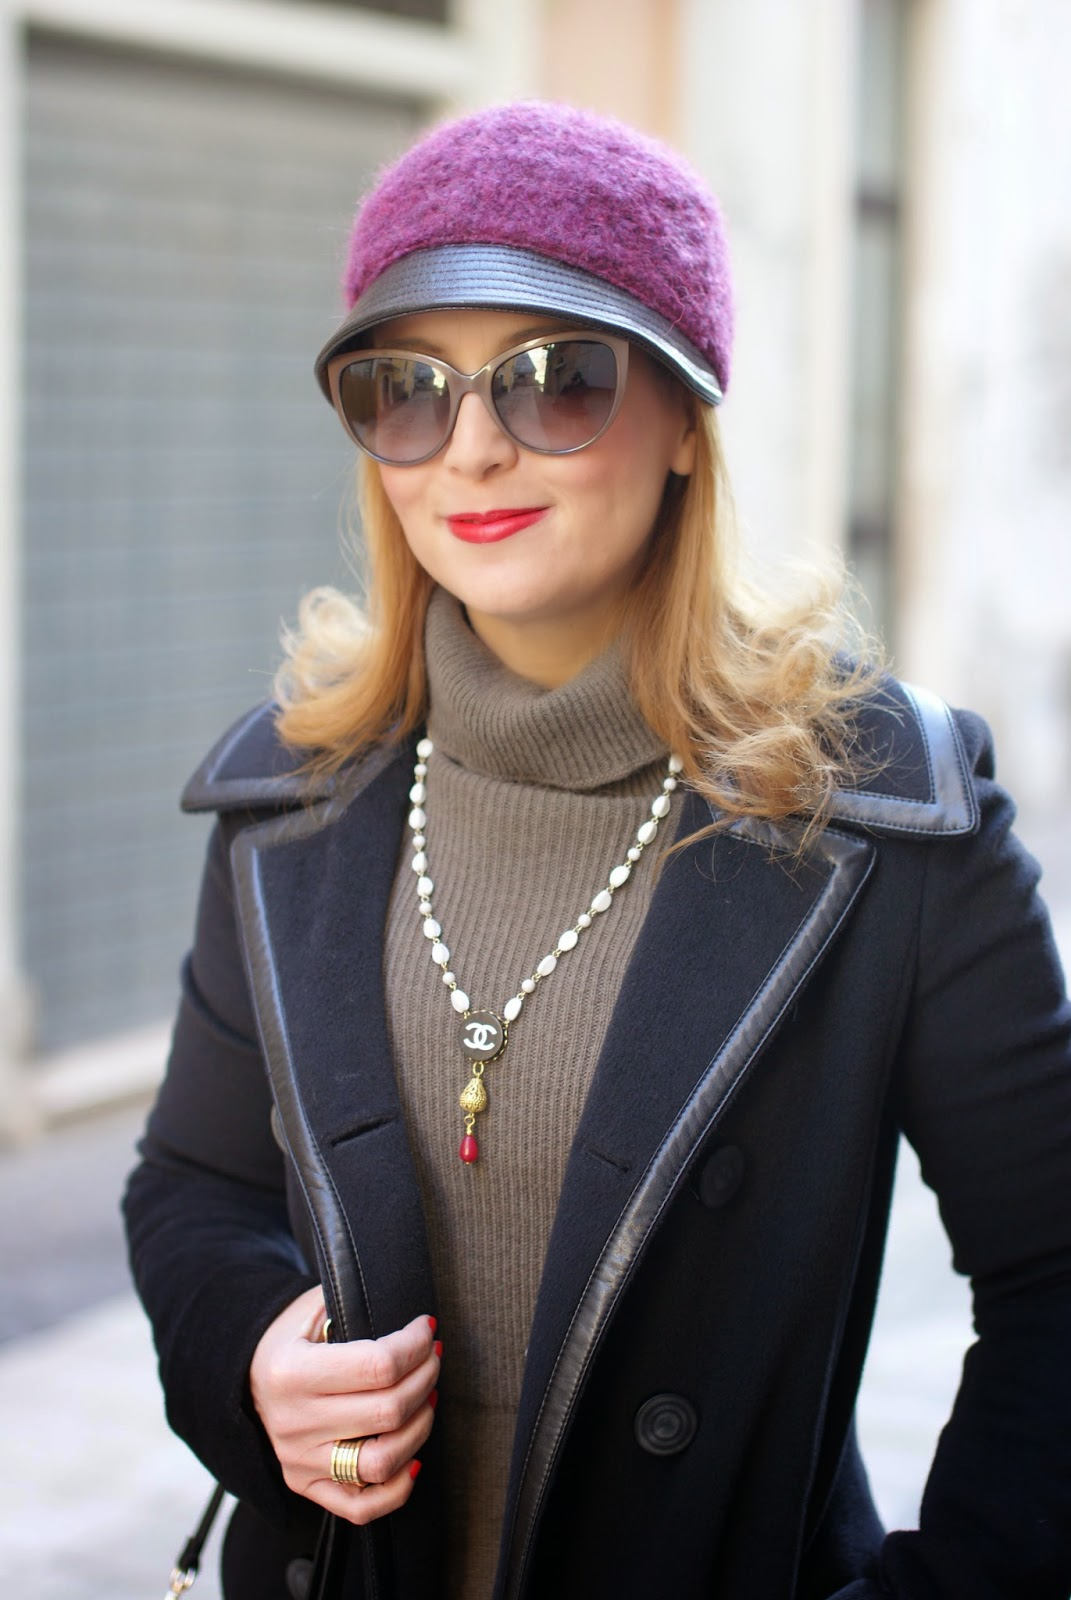 Balenciaga black coat, jockey hat, Chanel inspired necklace, Sofia borse Candy pochette, Fashion and Cookies, fashion blogger